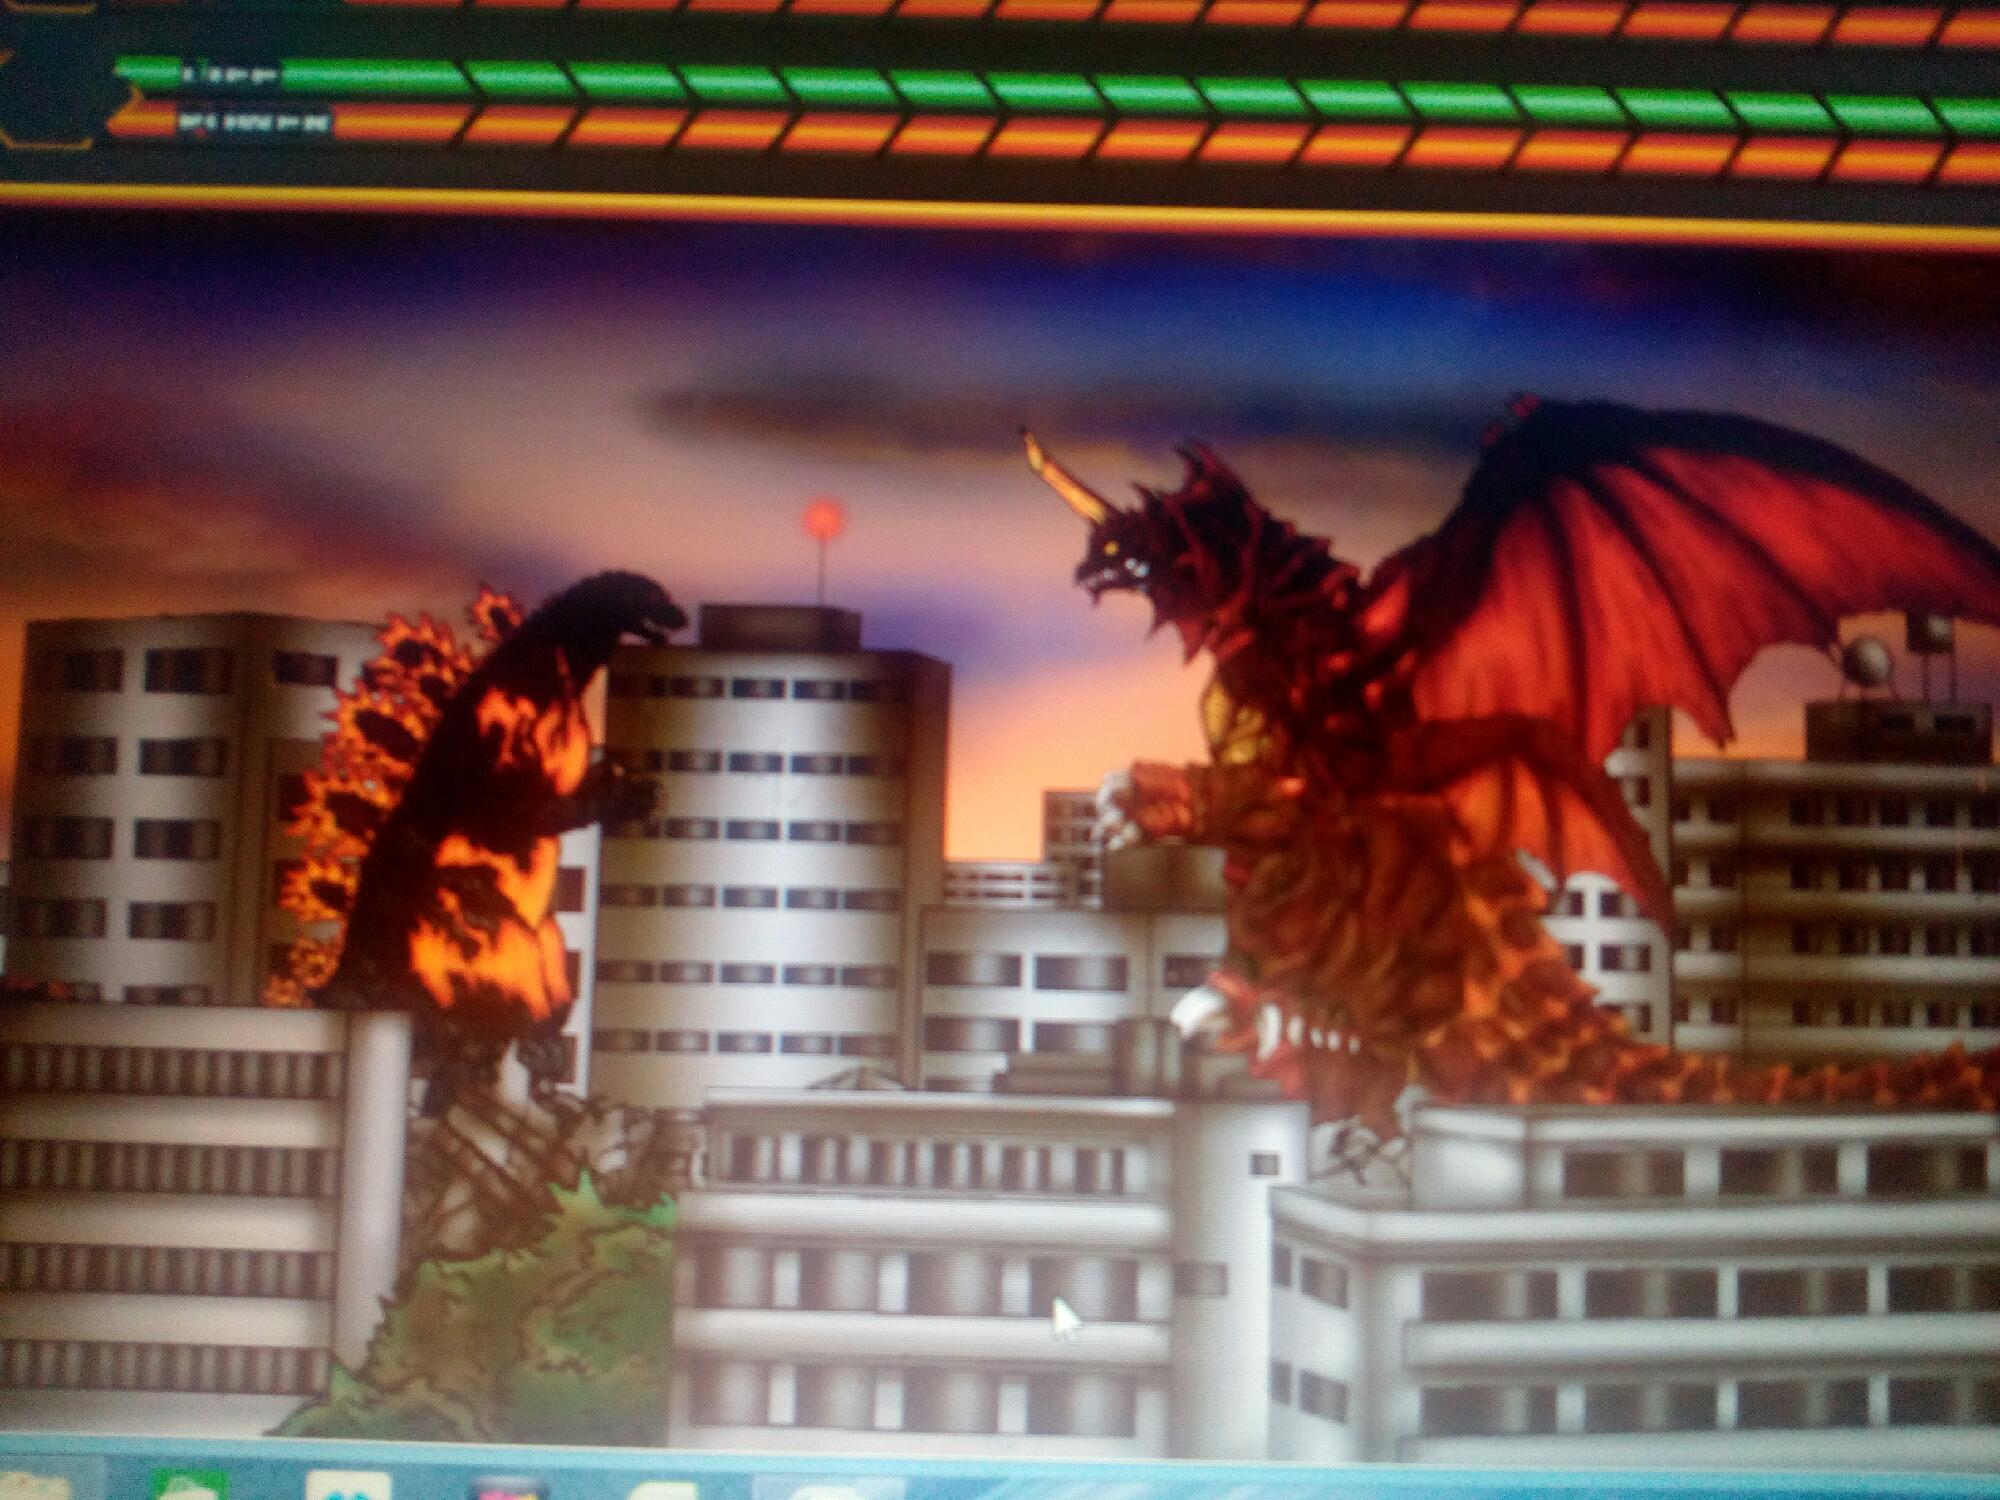 Godzilla vs destroya